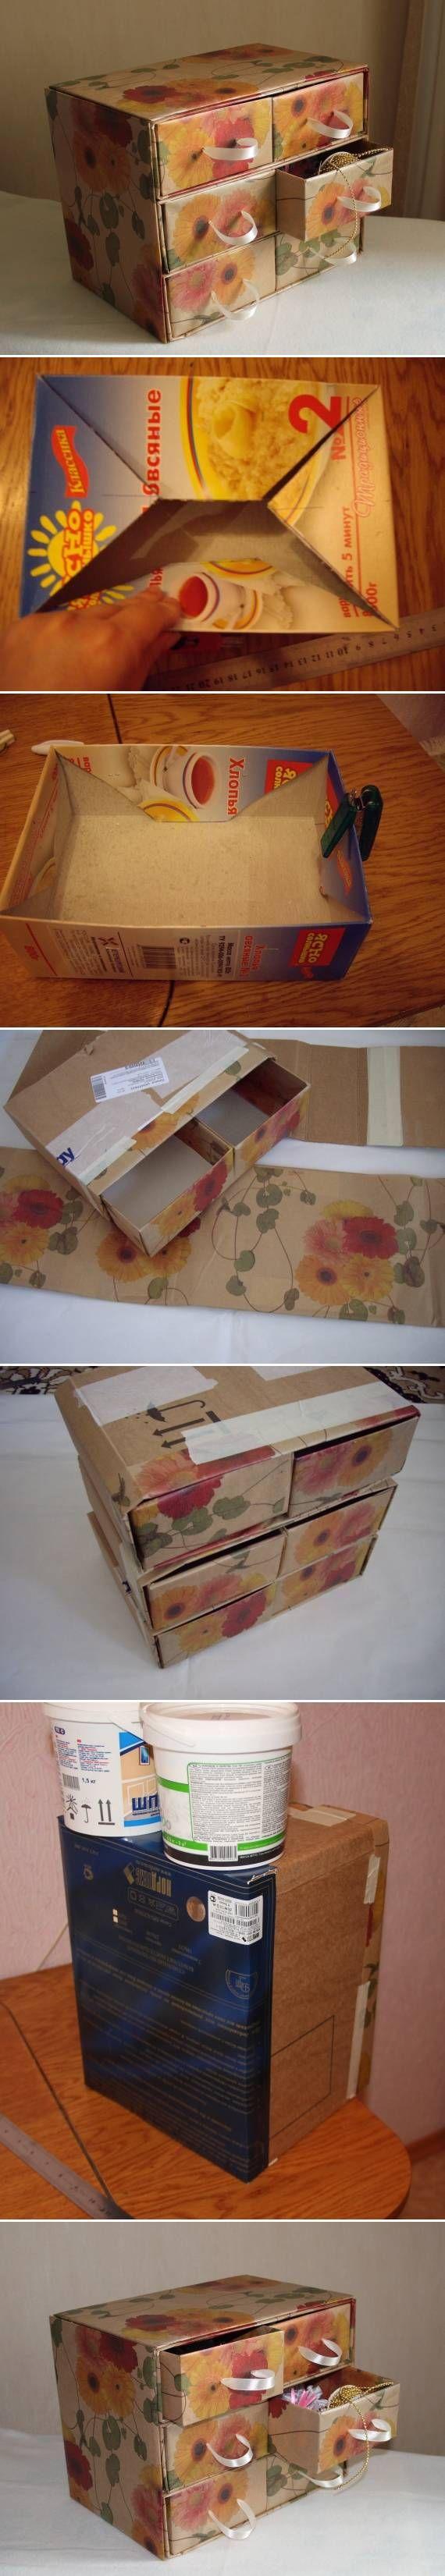 Poitrine de bricolage de carton